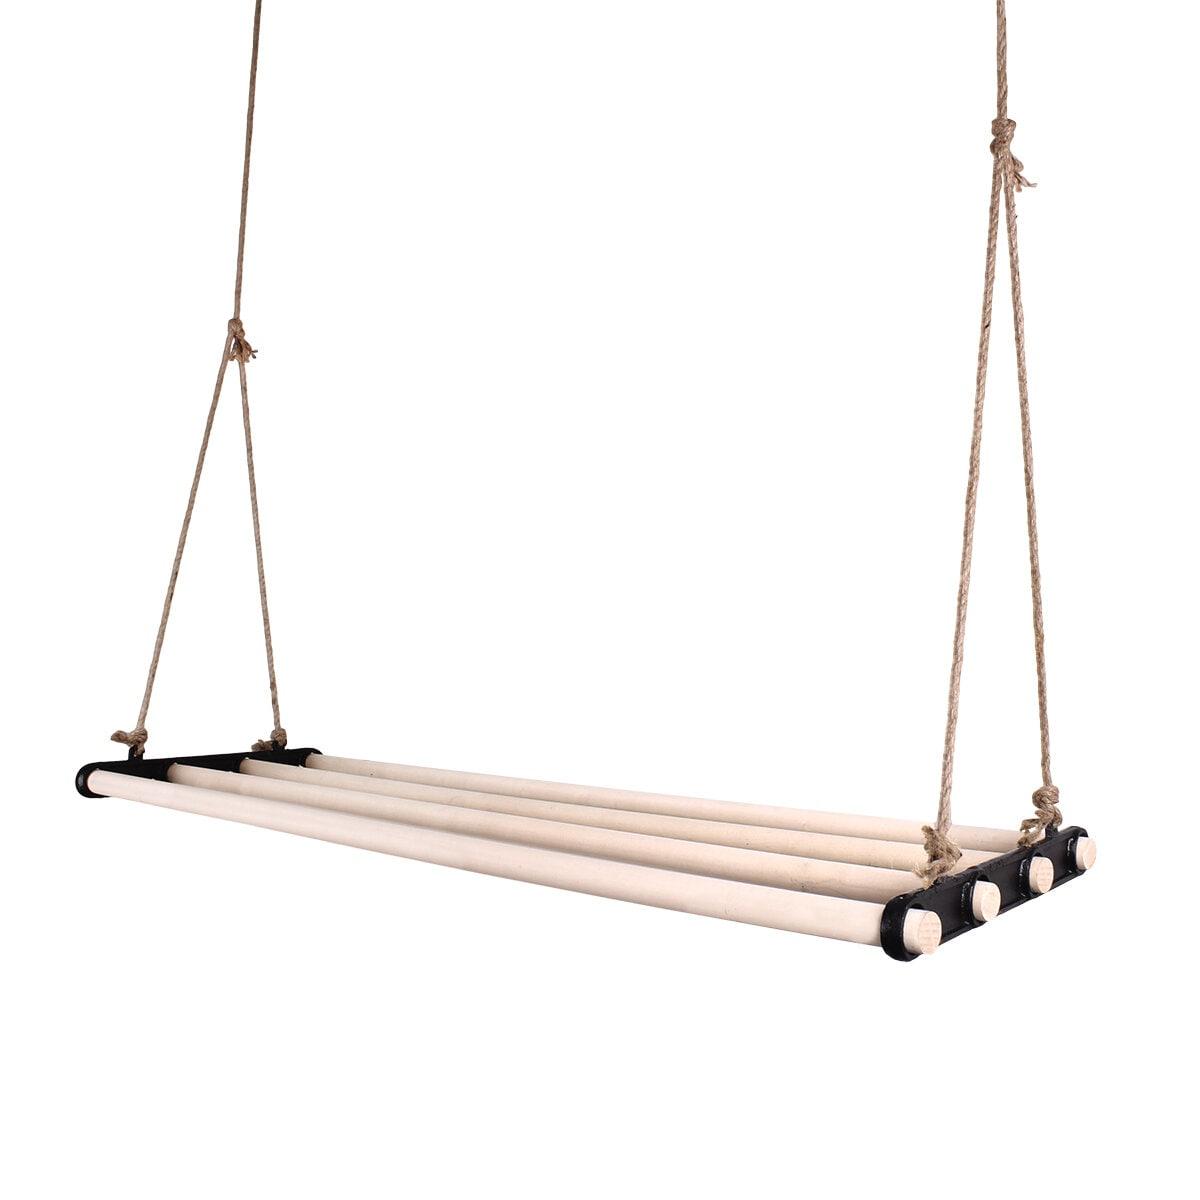 Hanging Drying Rack Egon Cast Iron Black